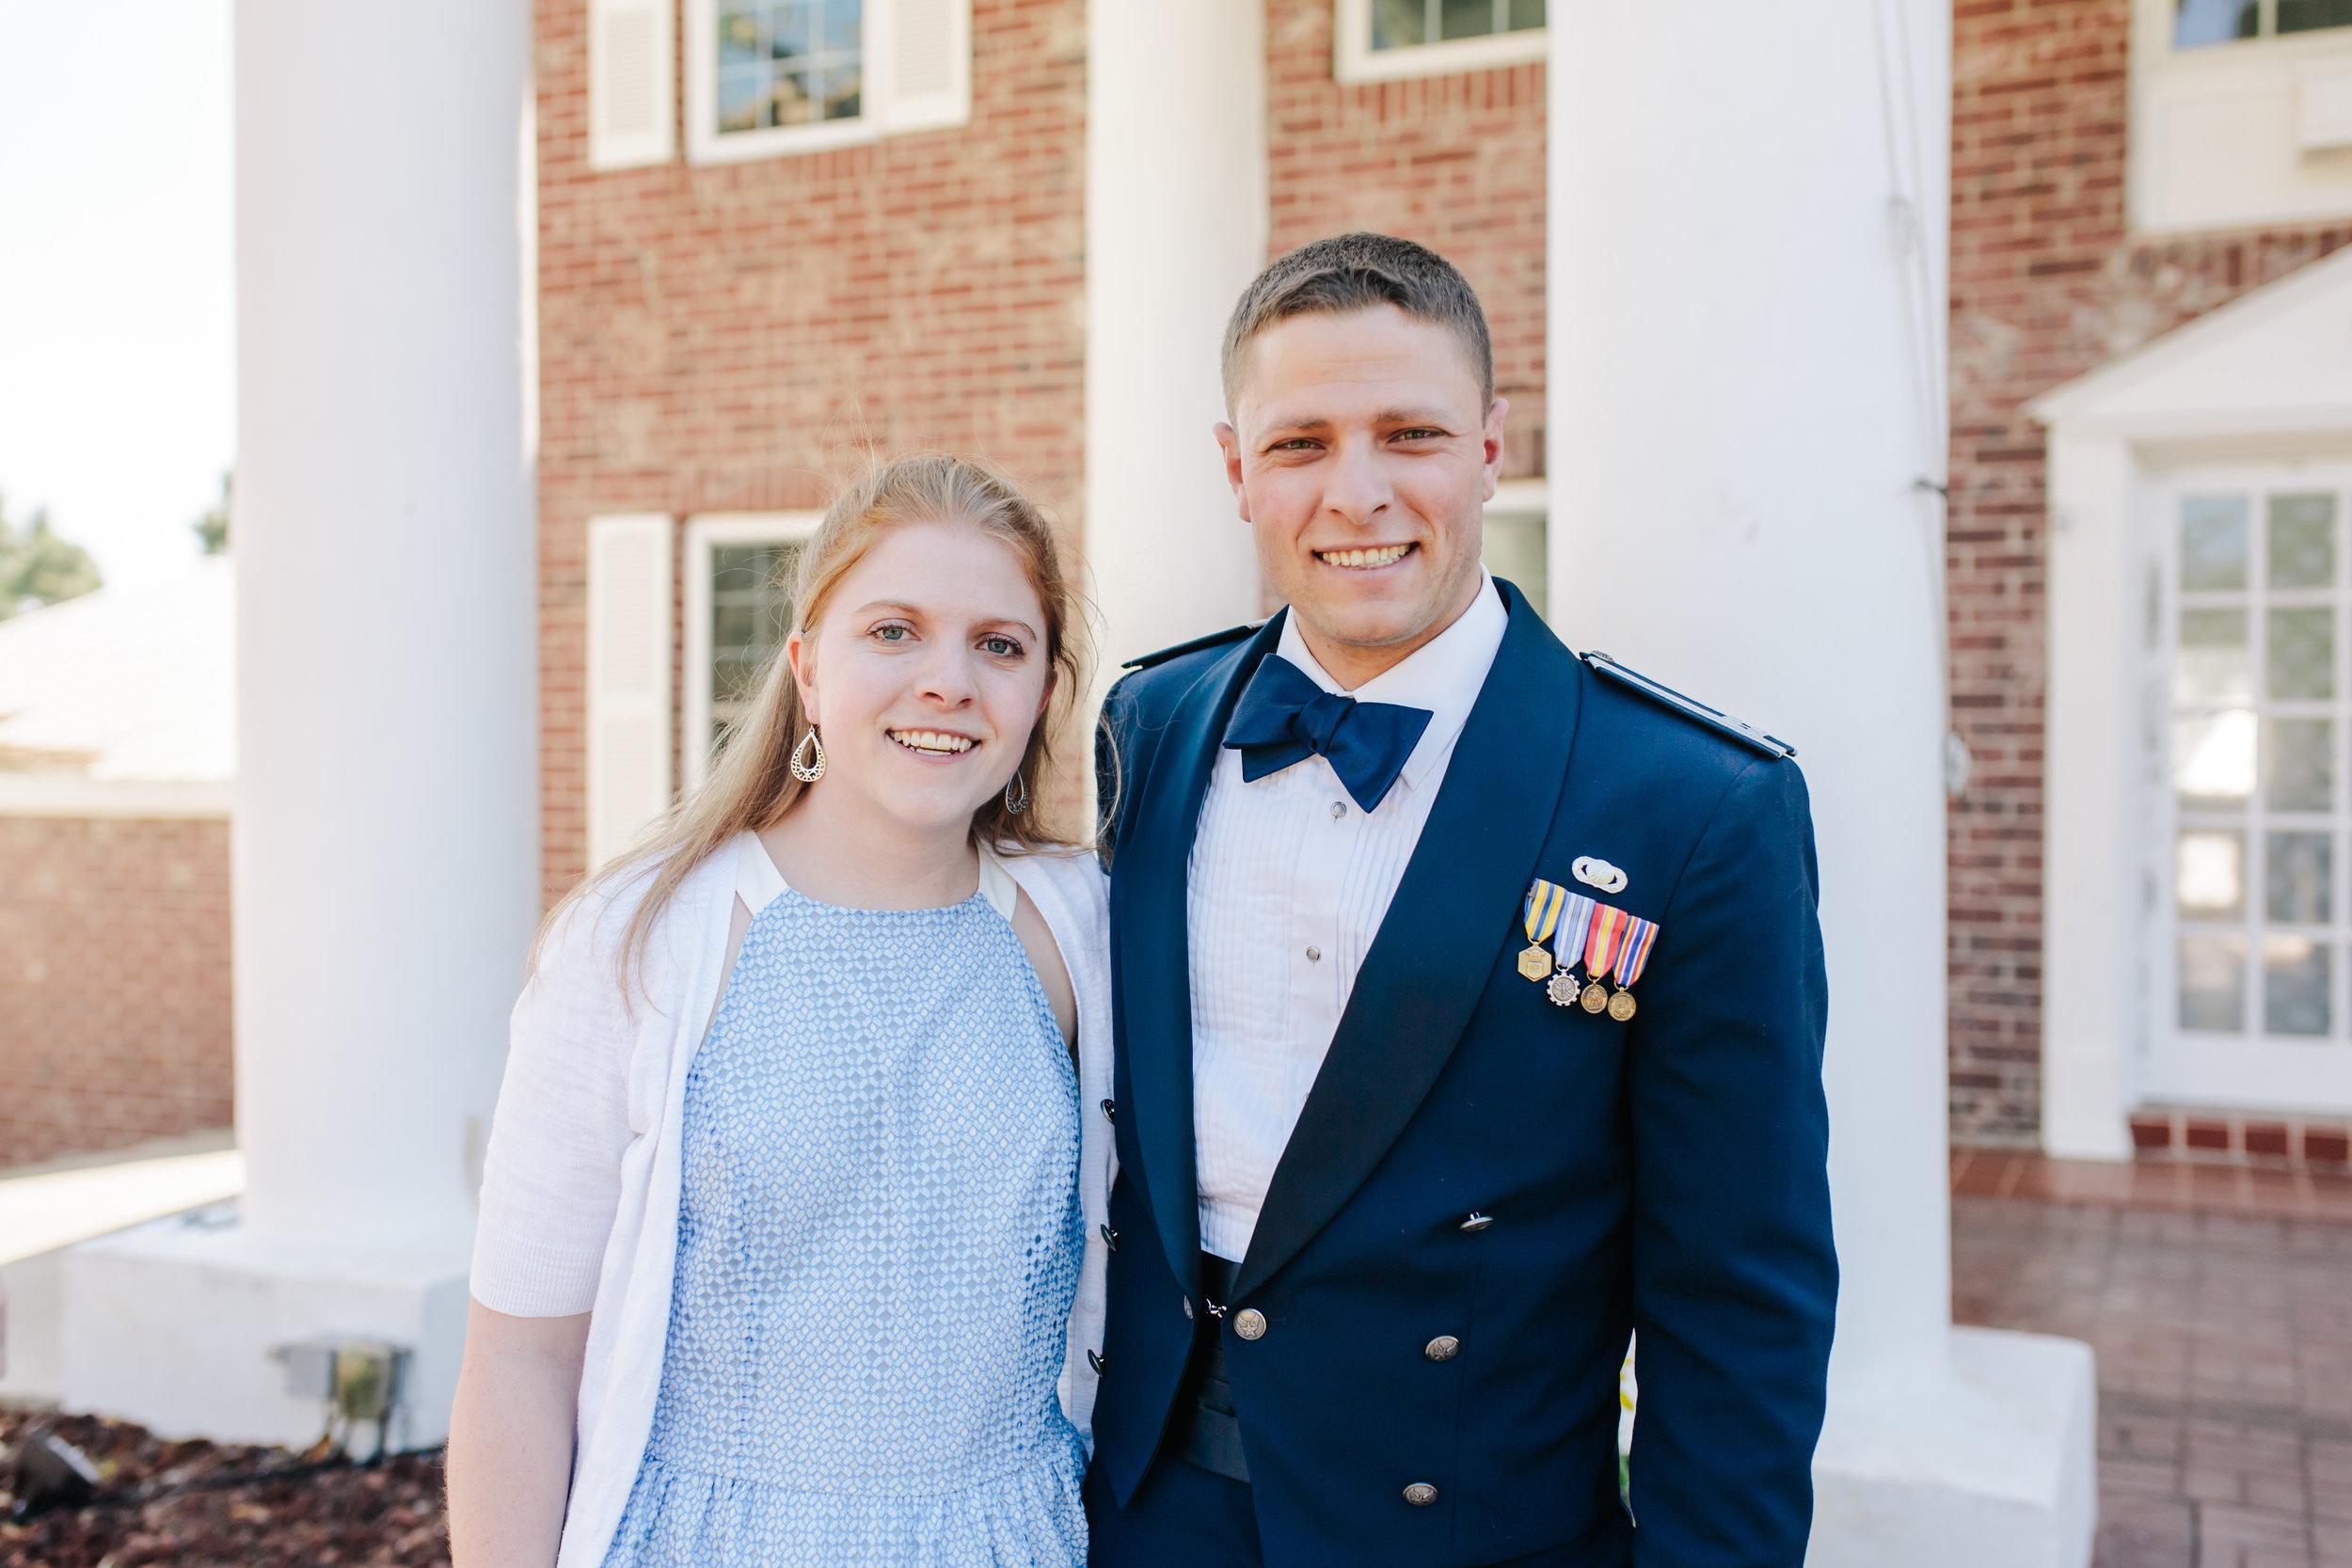 2018.03.17 Allison and Chuck Wedding Waelti Melbourne (415 of 569).jpg